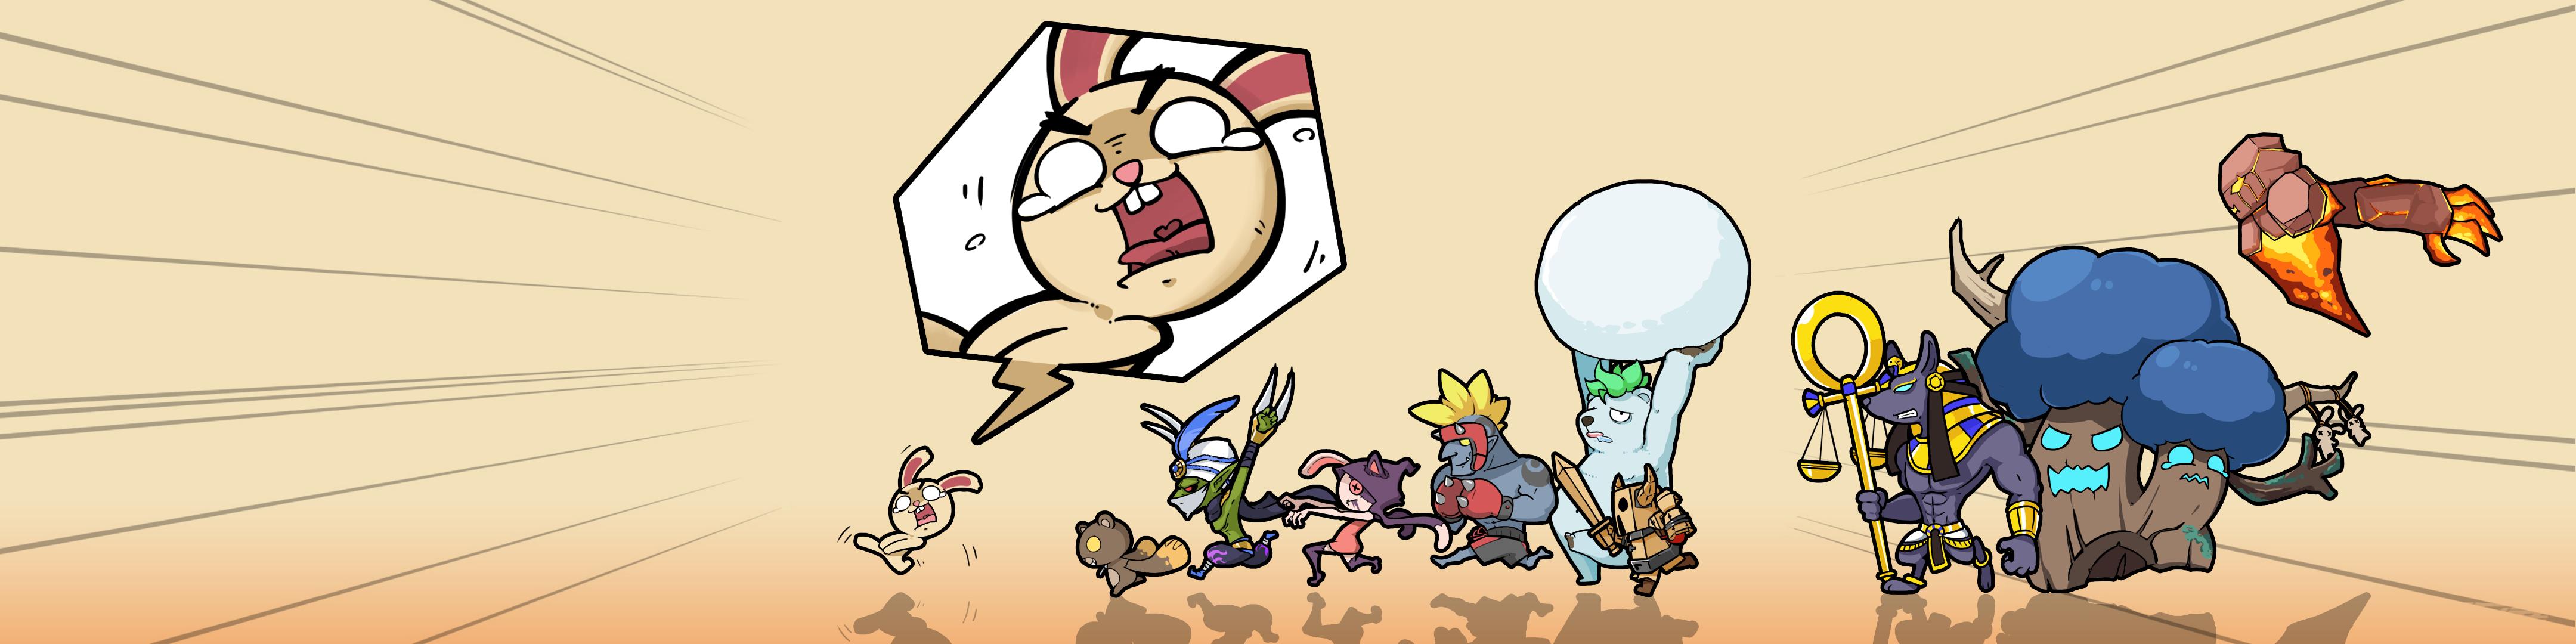 The Arcade Rabbit